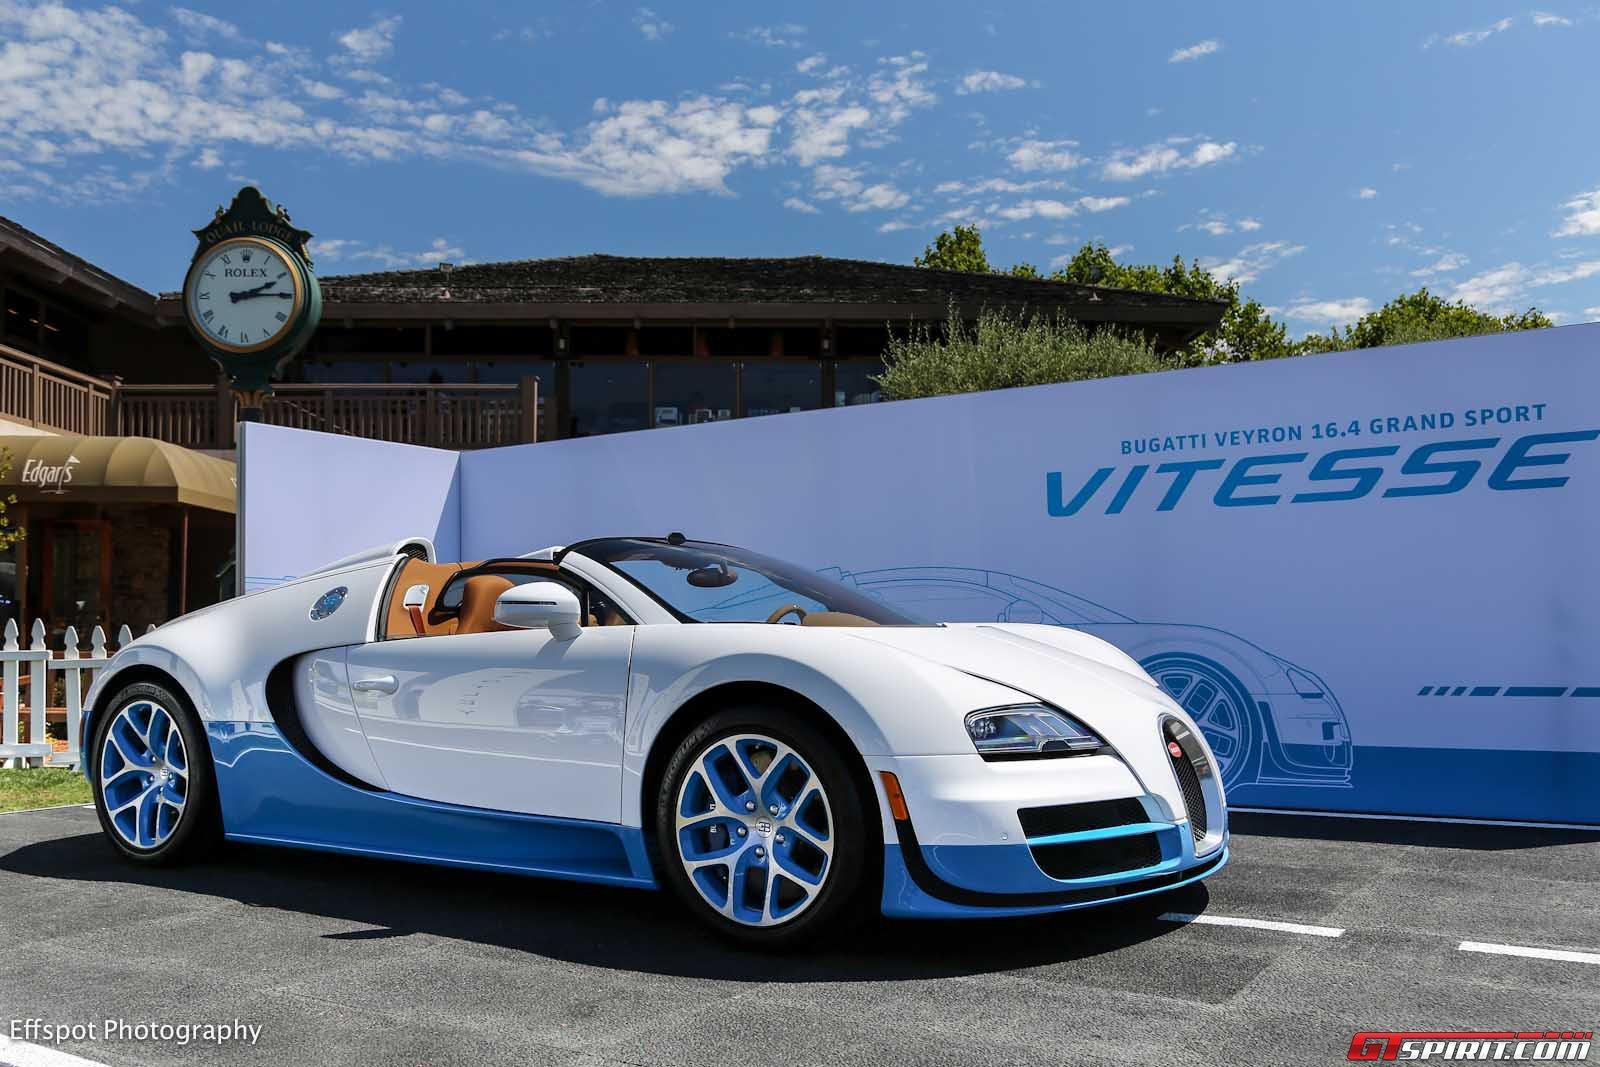 special edition bugatti veyron grand sport vitesse at monterey 2012. Black Bedroom Furniture Sets. Home Design Ideas